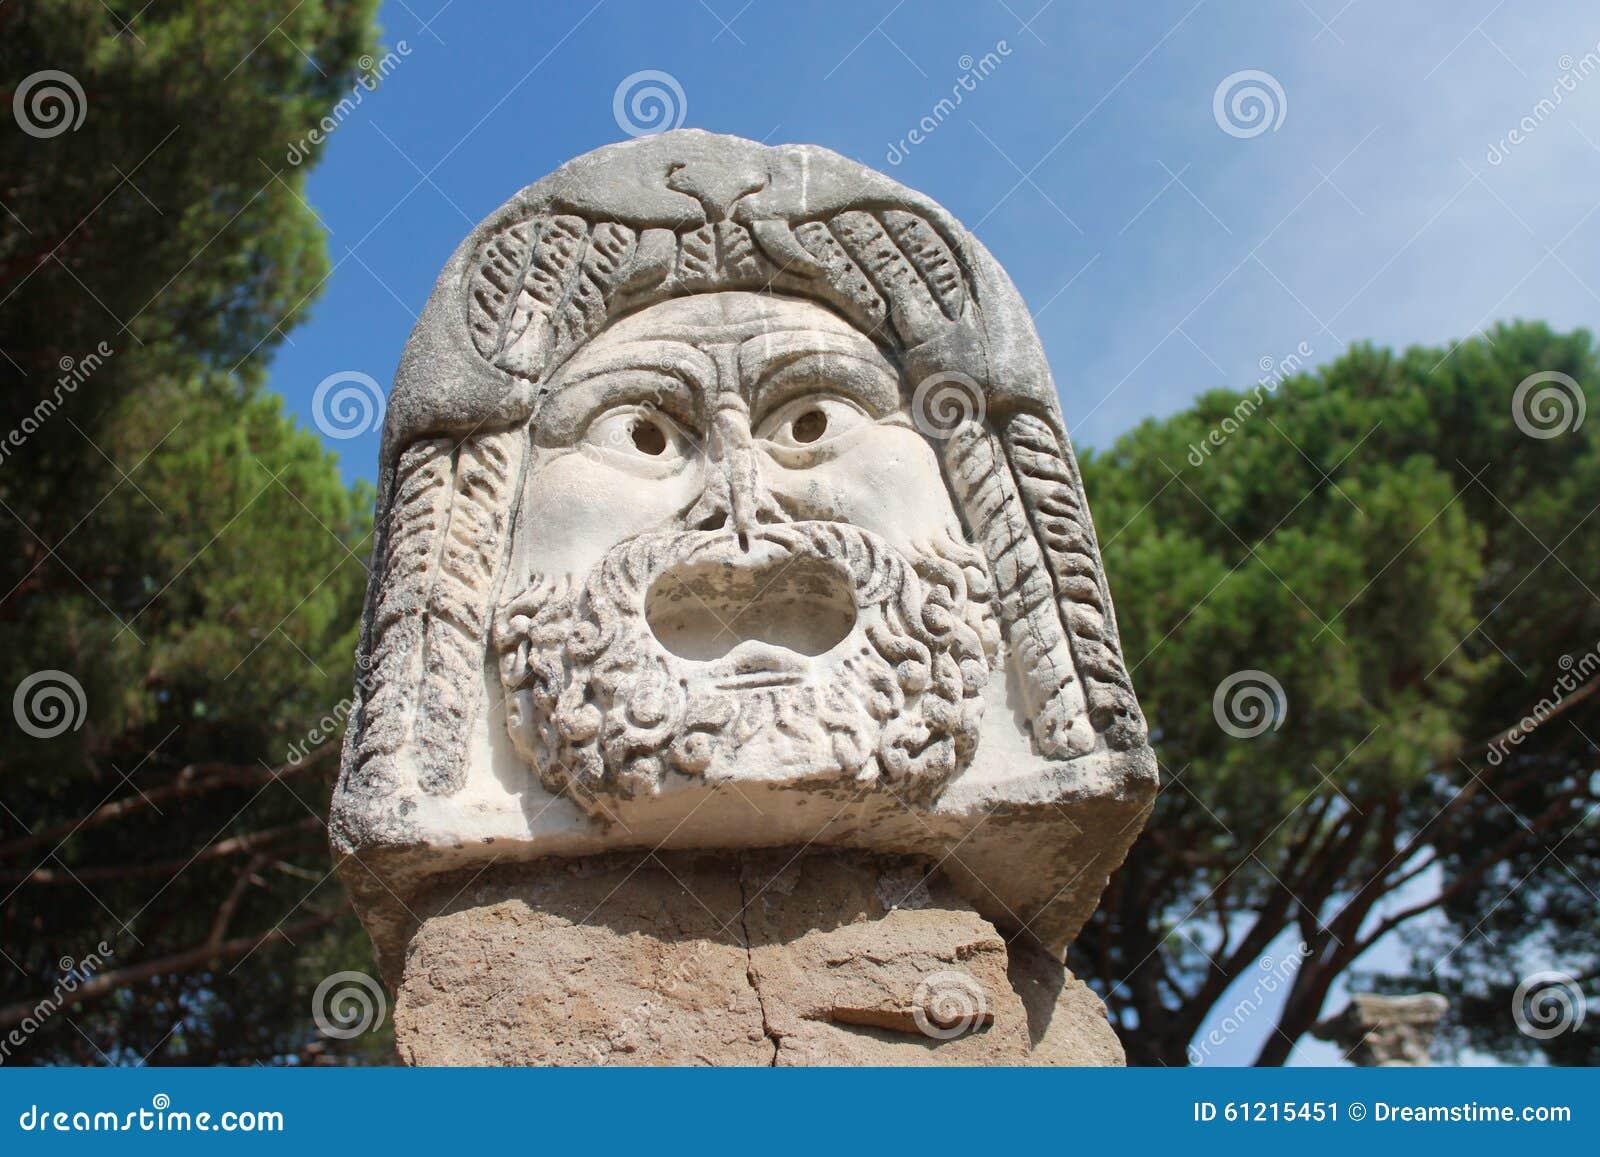 Ancient roman sculpture stock photo image 61215451 for Mr arredamenti ostia antica